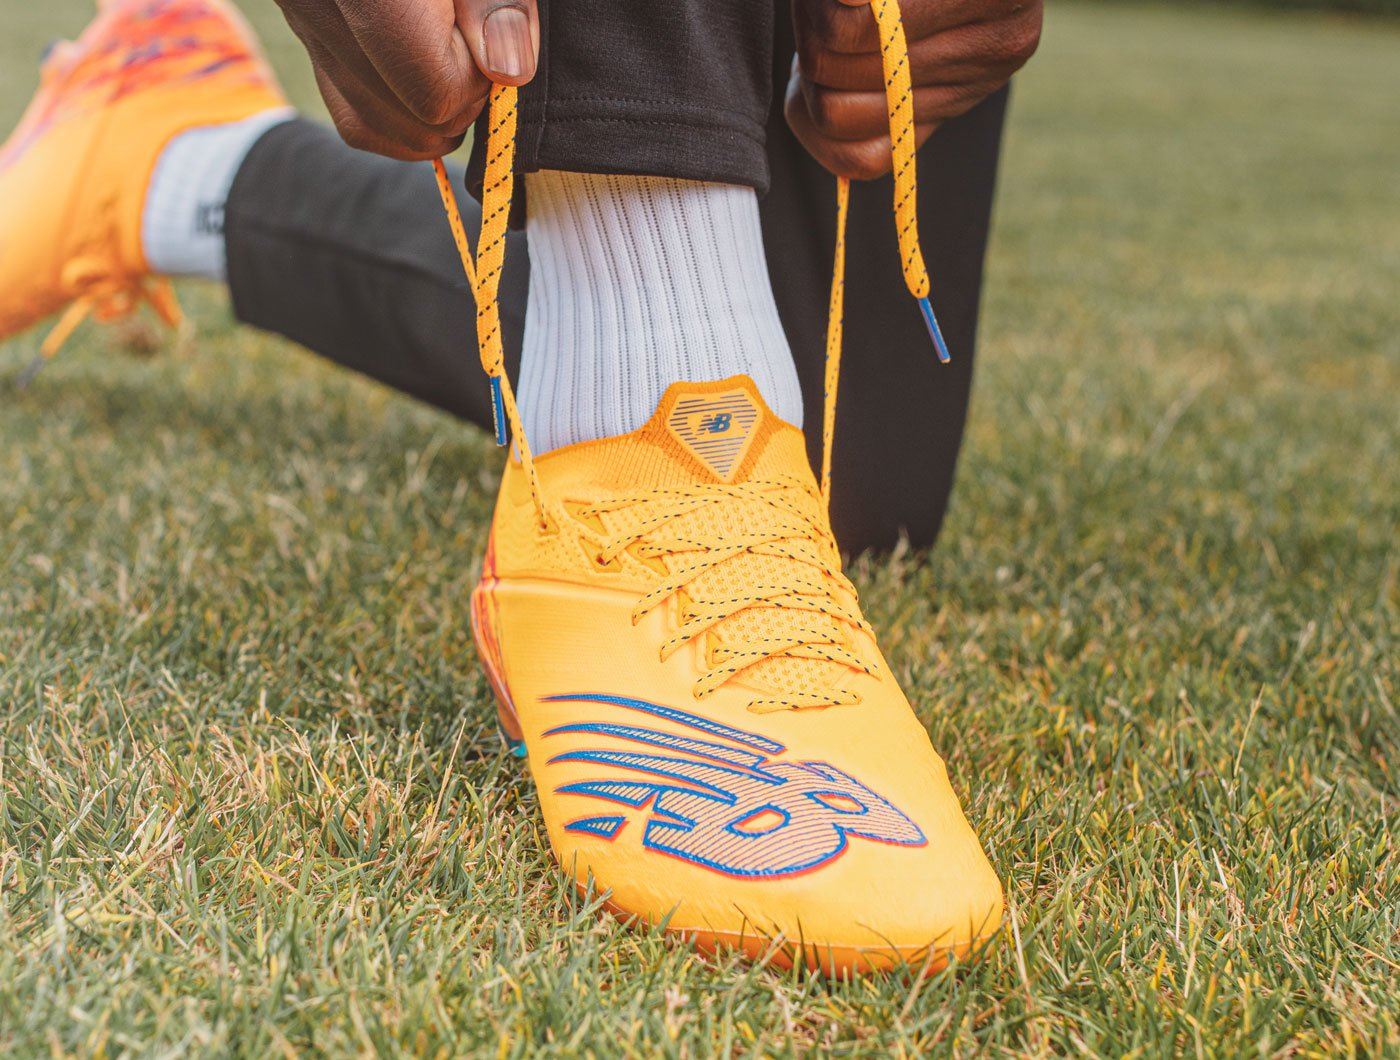 3efeac8af Football Boots - Nike